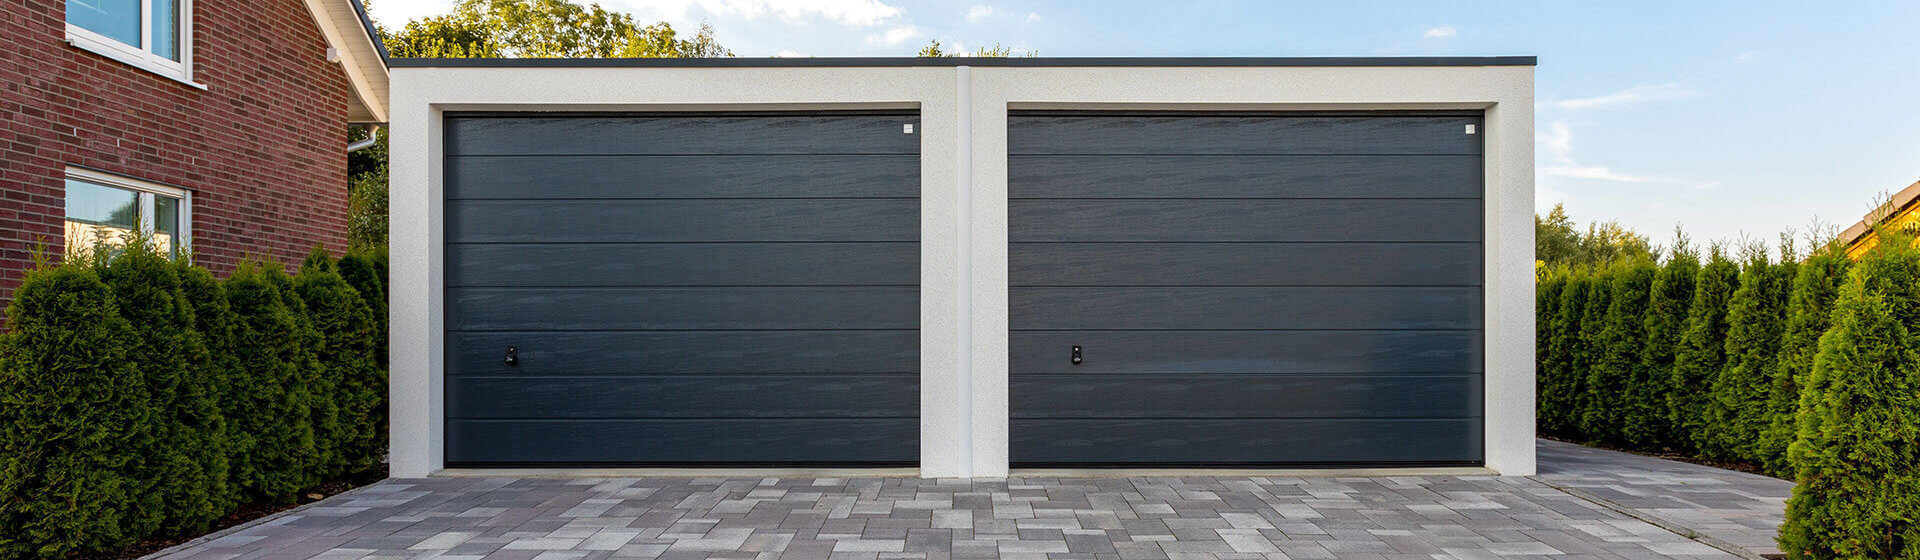 garage doubles